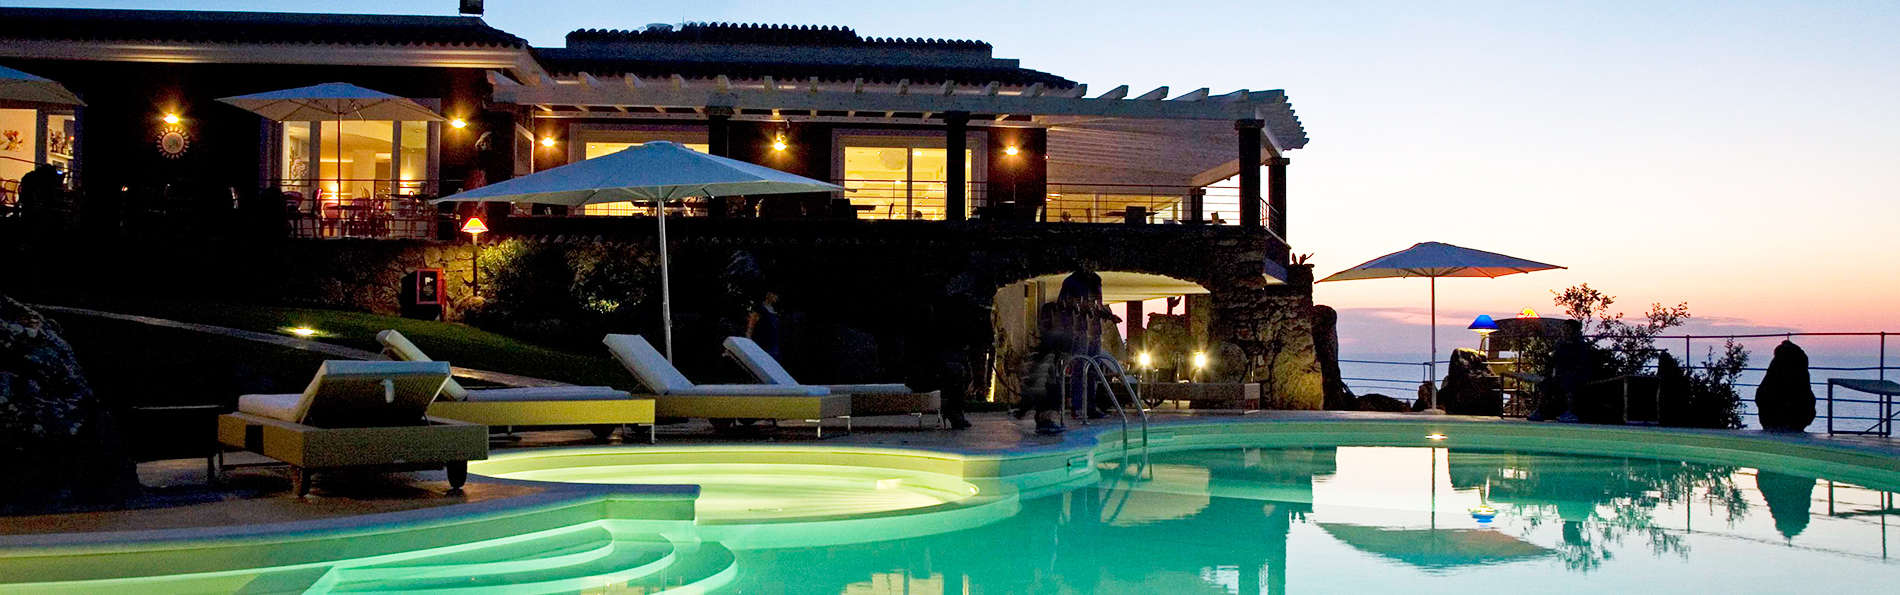 Bajaloglia Resort - edit_pool.jpg